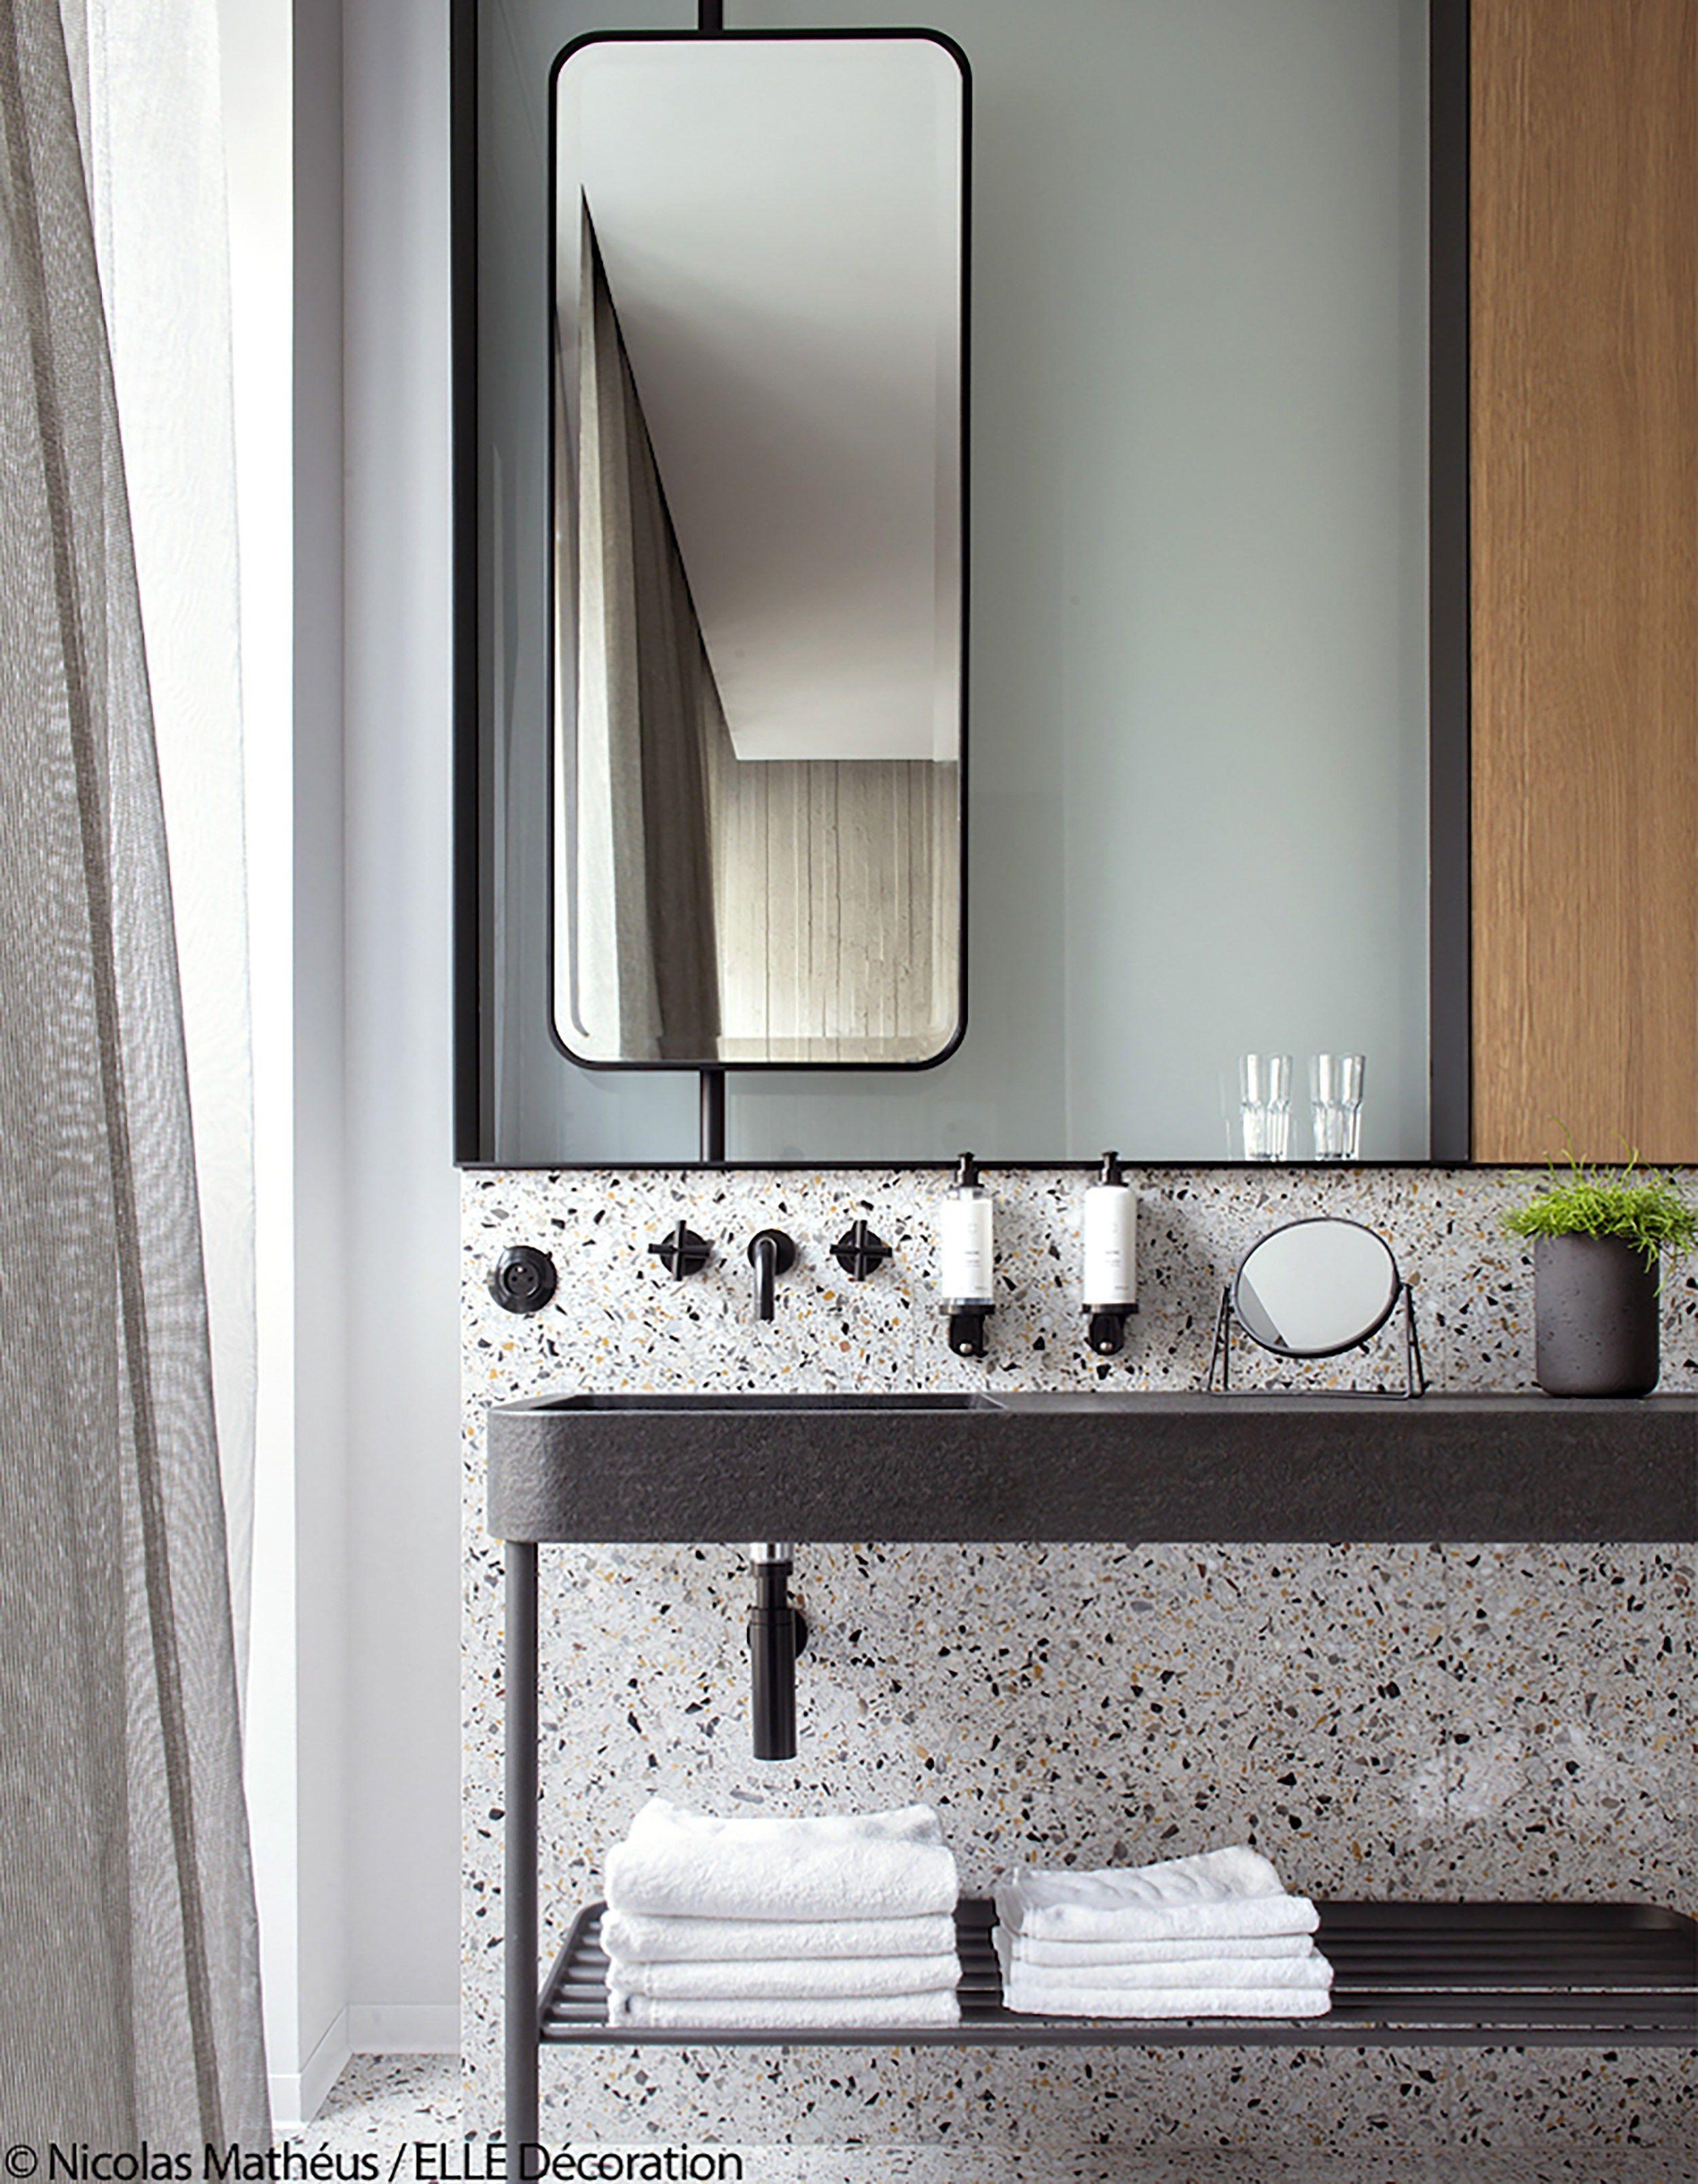 17 Fresh Inspiring Bathroom Mirror Ideas To Shake Up Your Morning Lipstick Routine Modern Bathroom Mirrors Bathroom Mirror Minimalist Bathroom